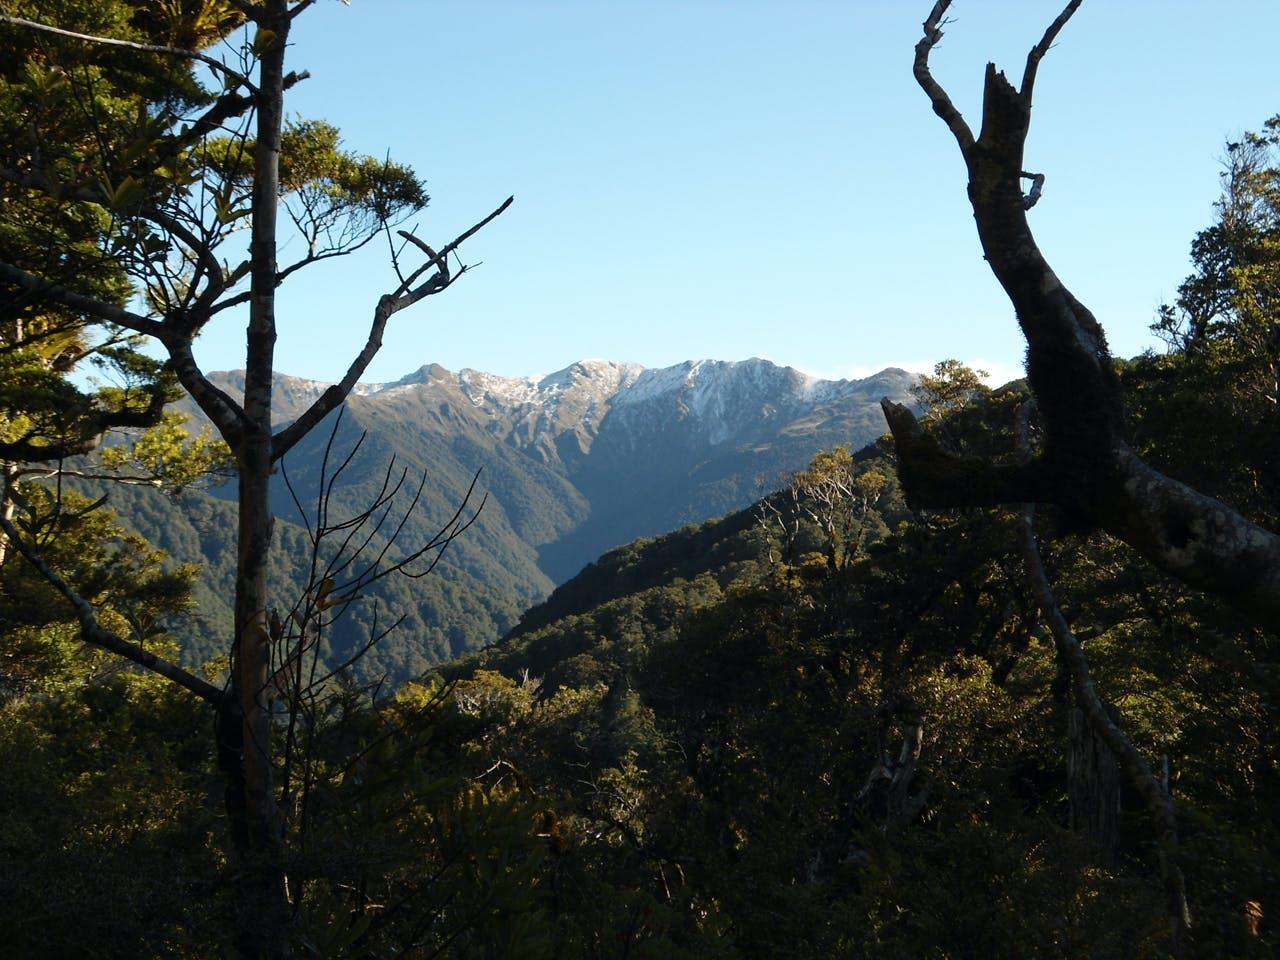 View towards Mt Hector. Photo: Matthew Pike